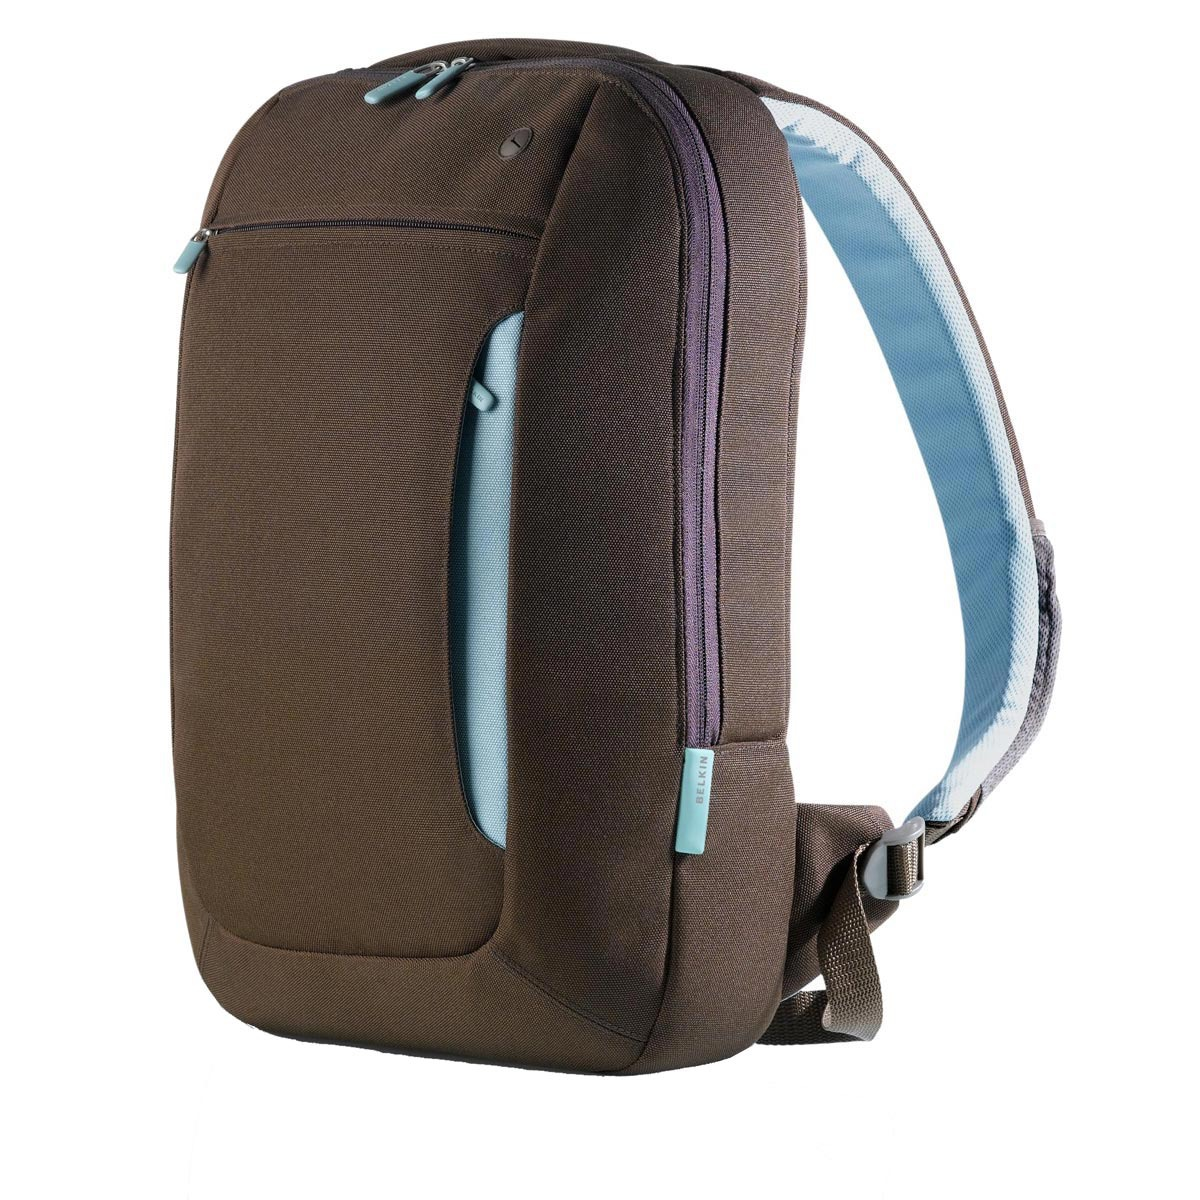 belkin sac dos pour ordinateur portable jusqu 39 15 6. Black Bedroom Furniture Sets. Home Design Ideas